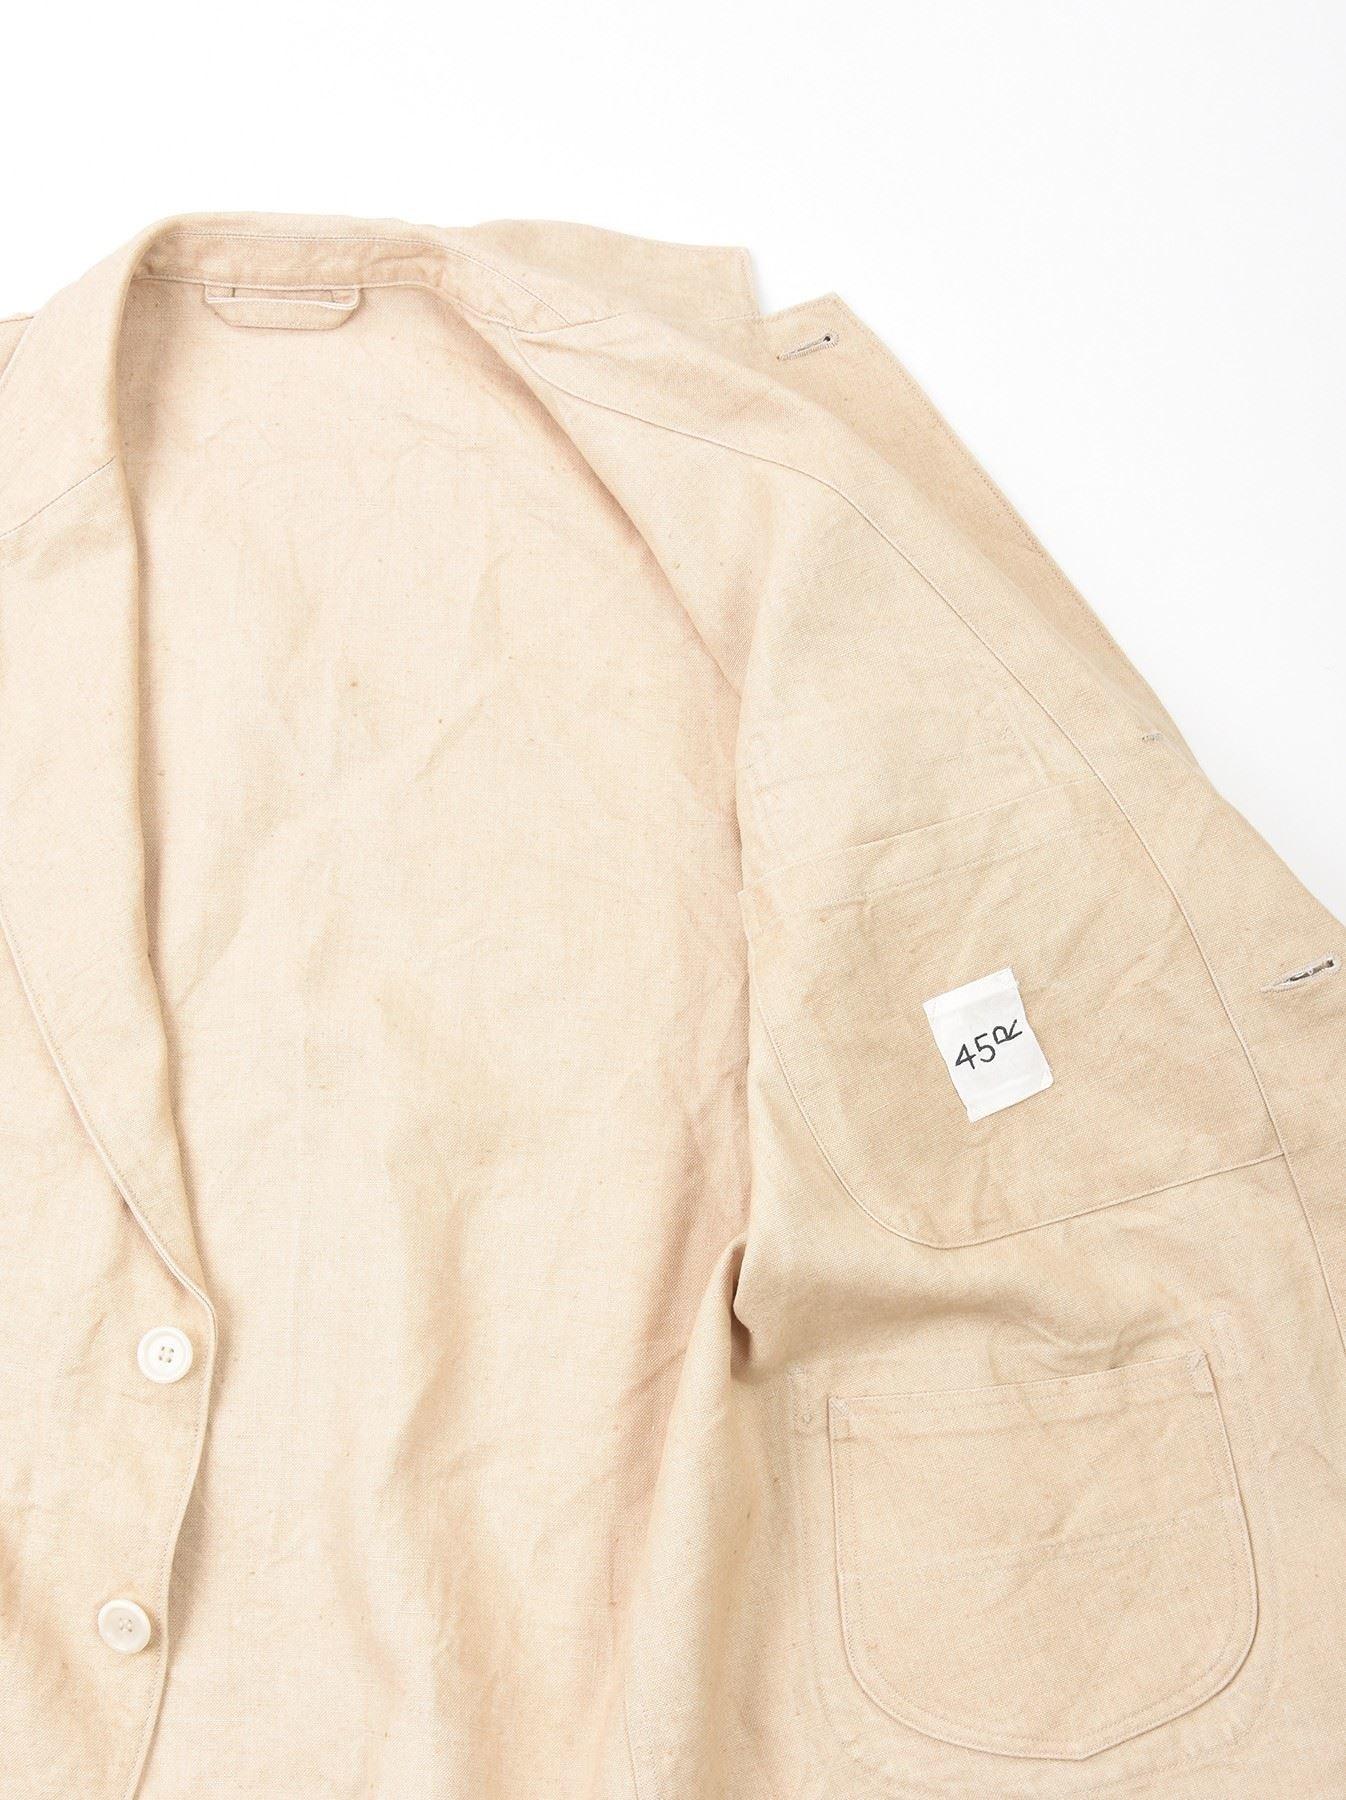 Linen Duck Asama Jacket-8